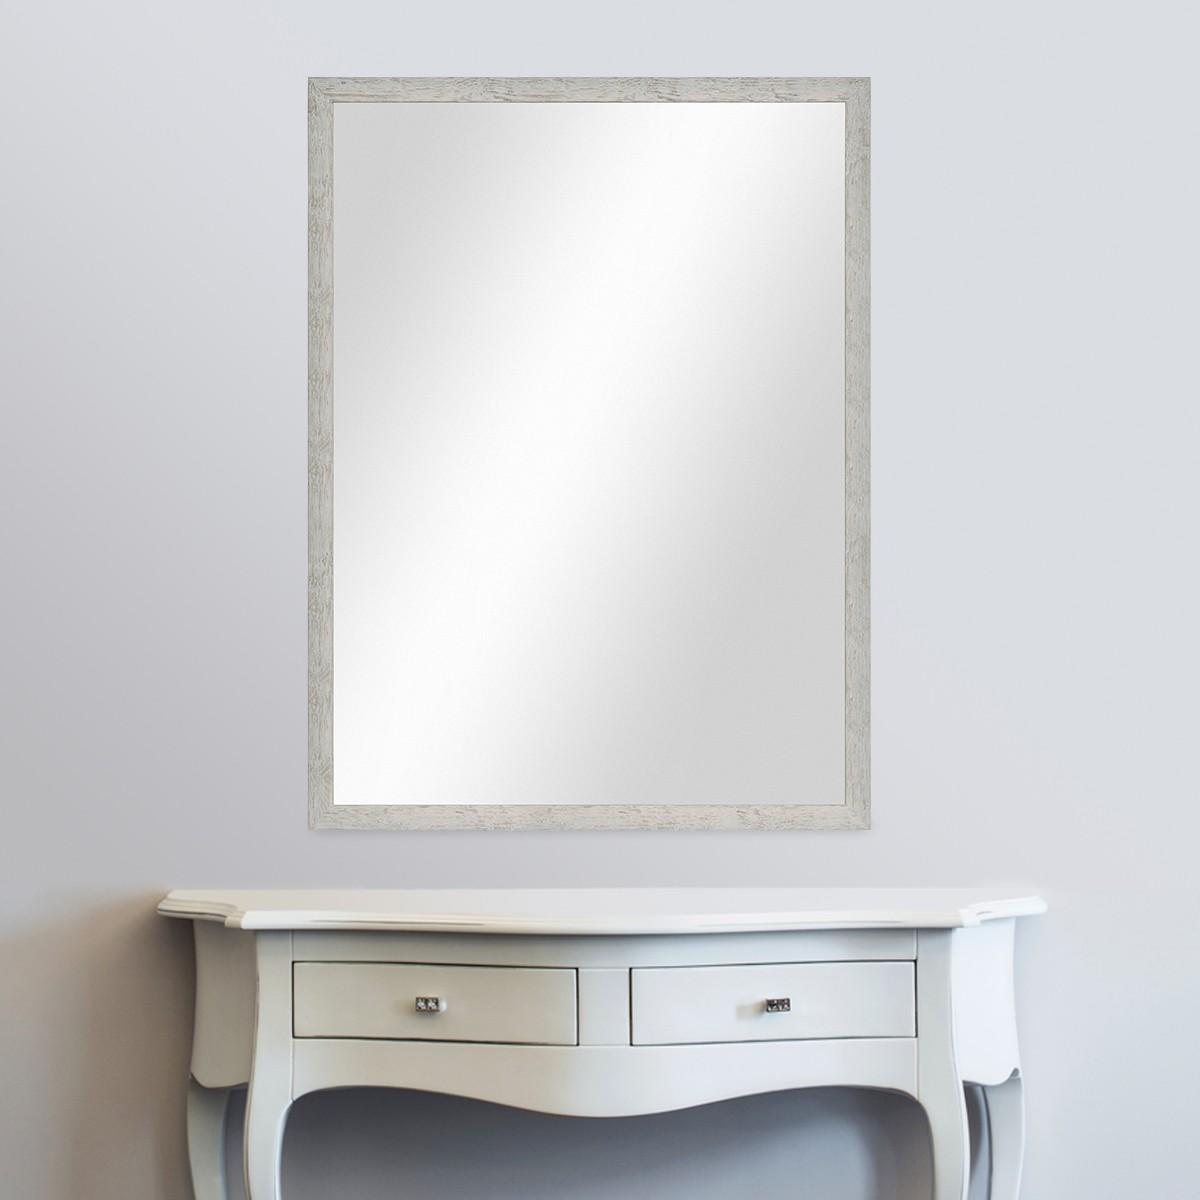 wand spiegel 66x86 cm im massivholz rahmen strandhaus stil rustikal grau spiegelfl che 60x80. Black Bedroom Furniture Sets. Home Design Ideas